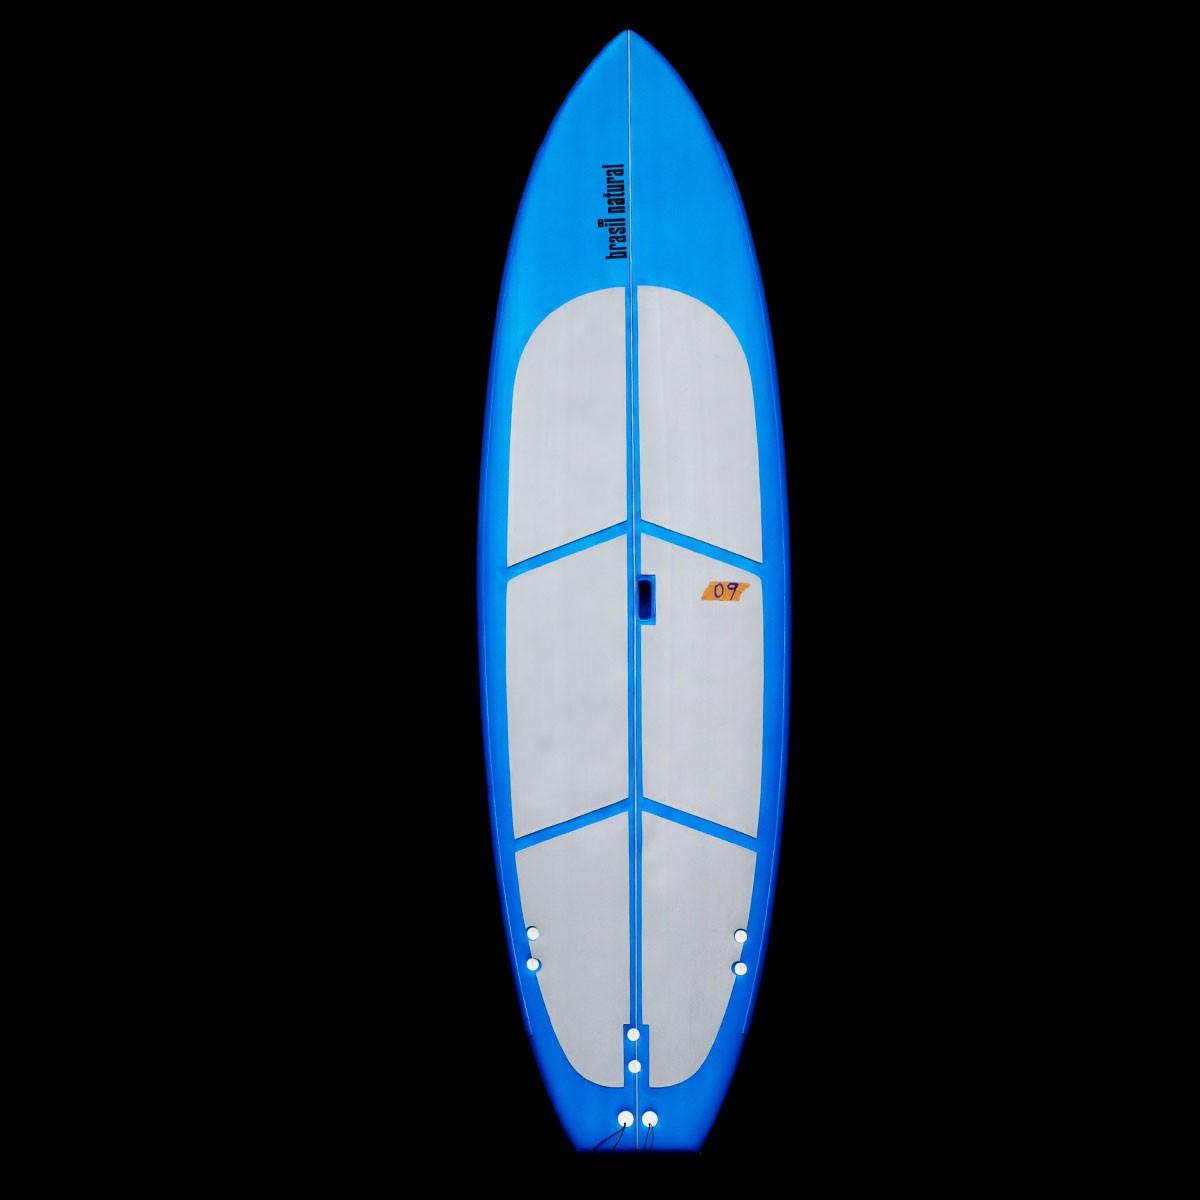 Prancha de stand up paddle 10 pés soft  rígido + kit remada OUTLET009